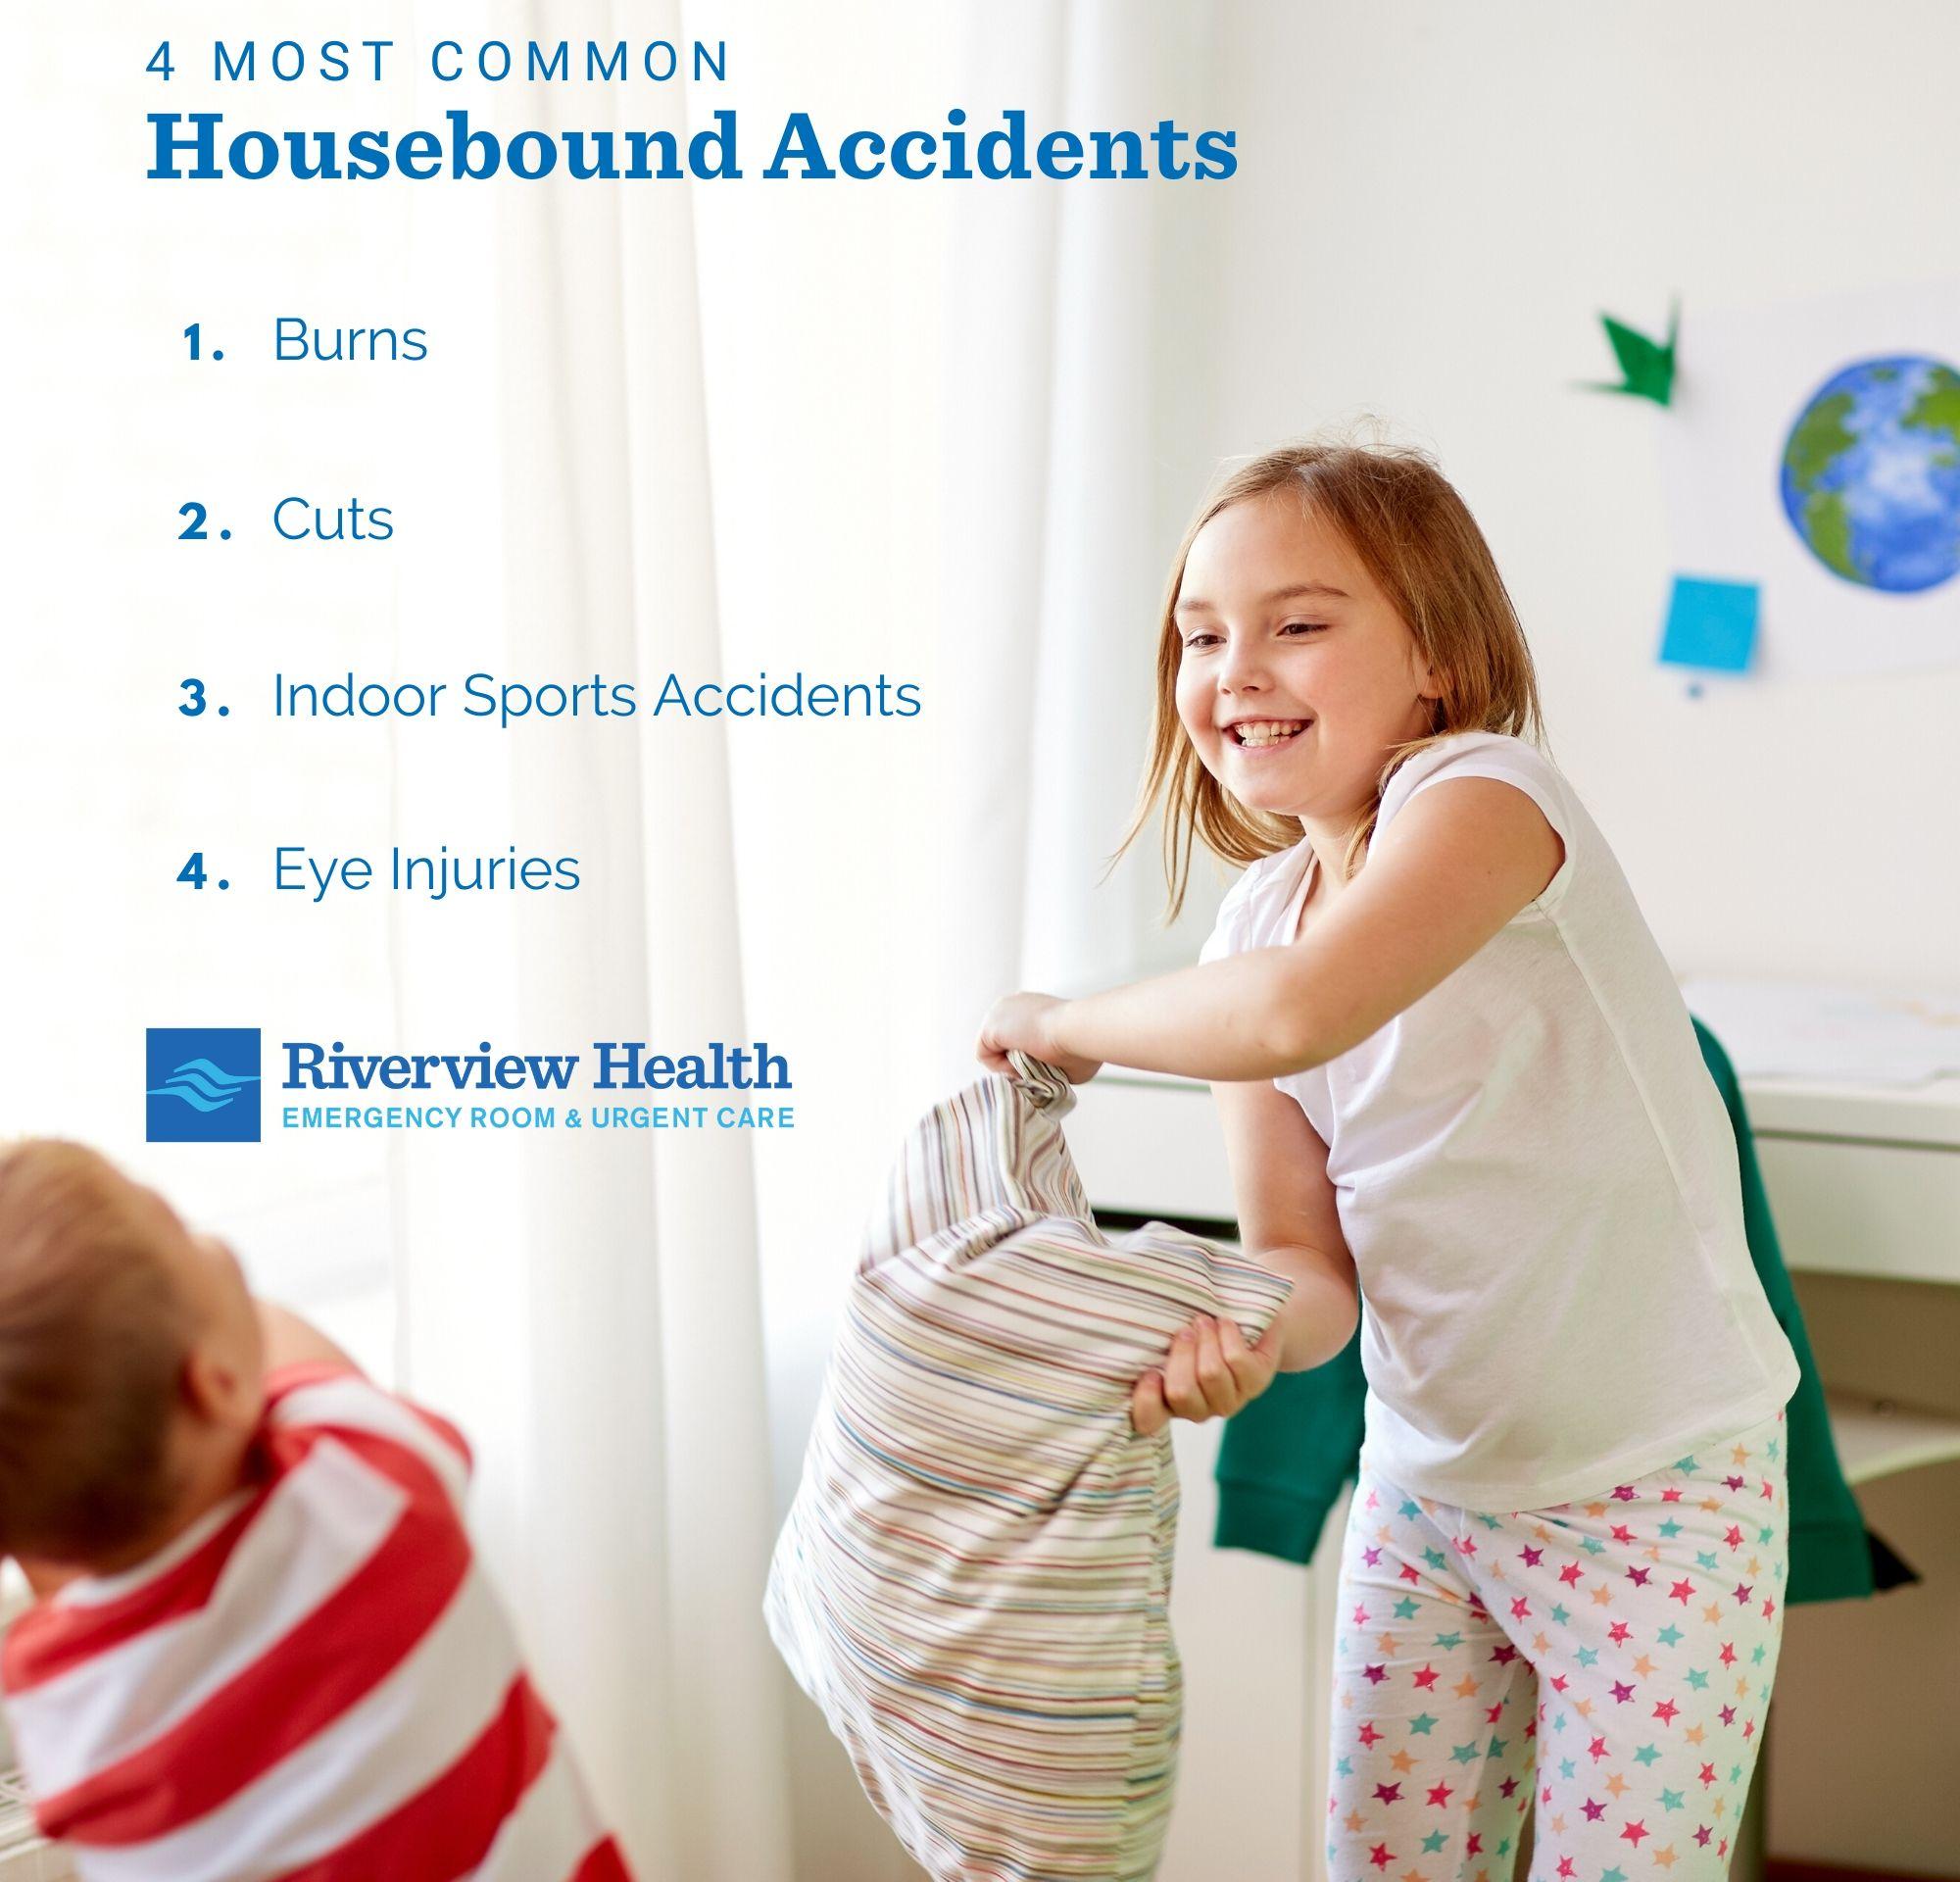 Common household accidents